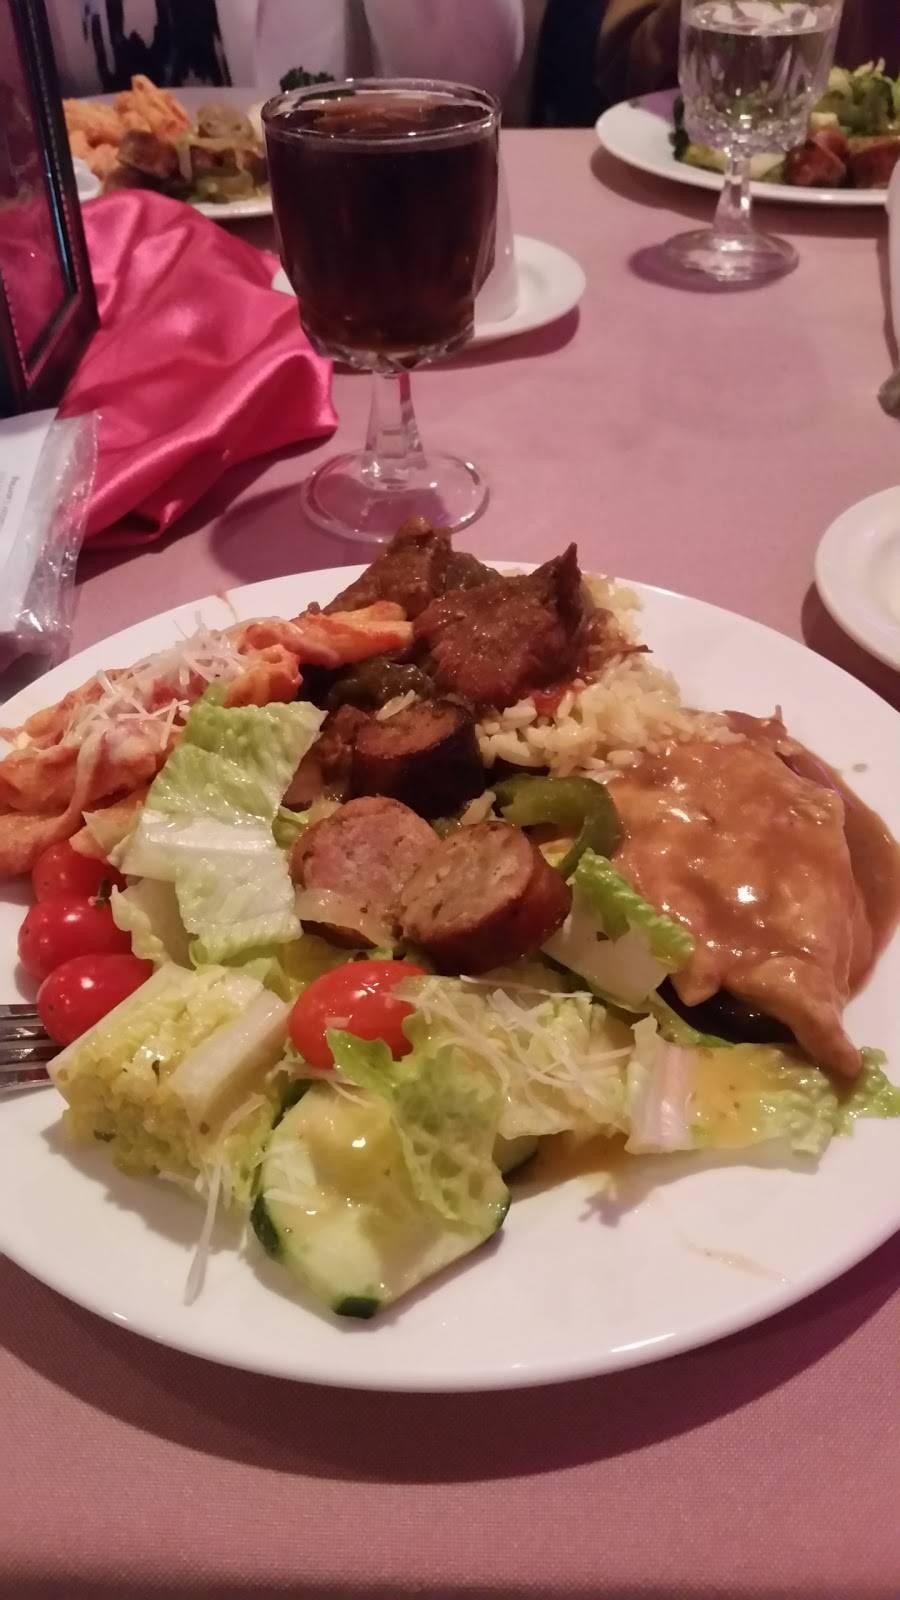 Chandelier   restaurant   1081 Broadway, Bayonne, NJ 07002, USA   2014377336 OR +1 201-437-7336